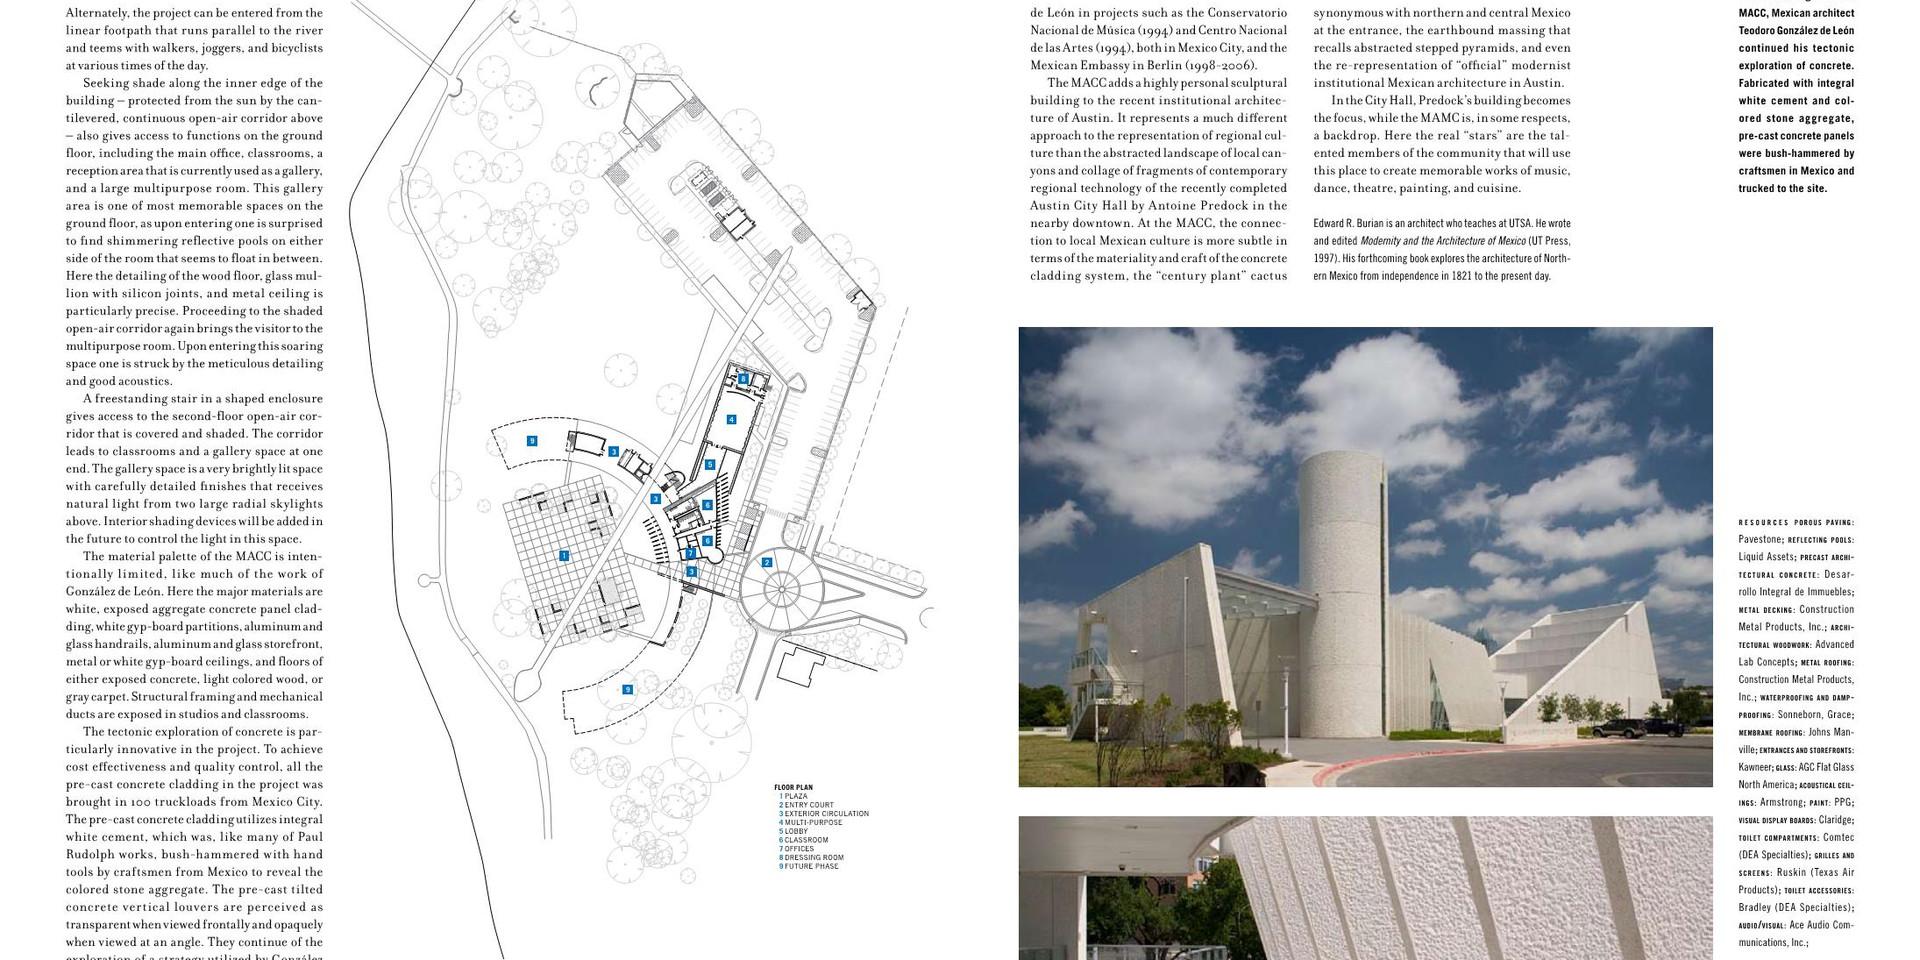 Texas Architect MACC Page 003.jpg